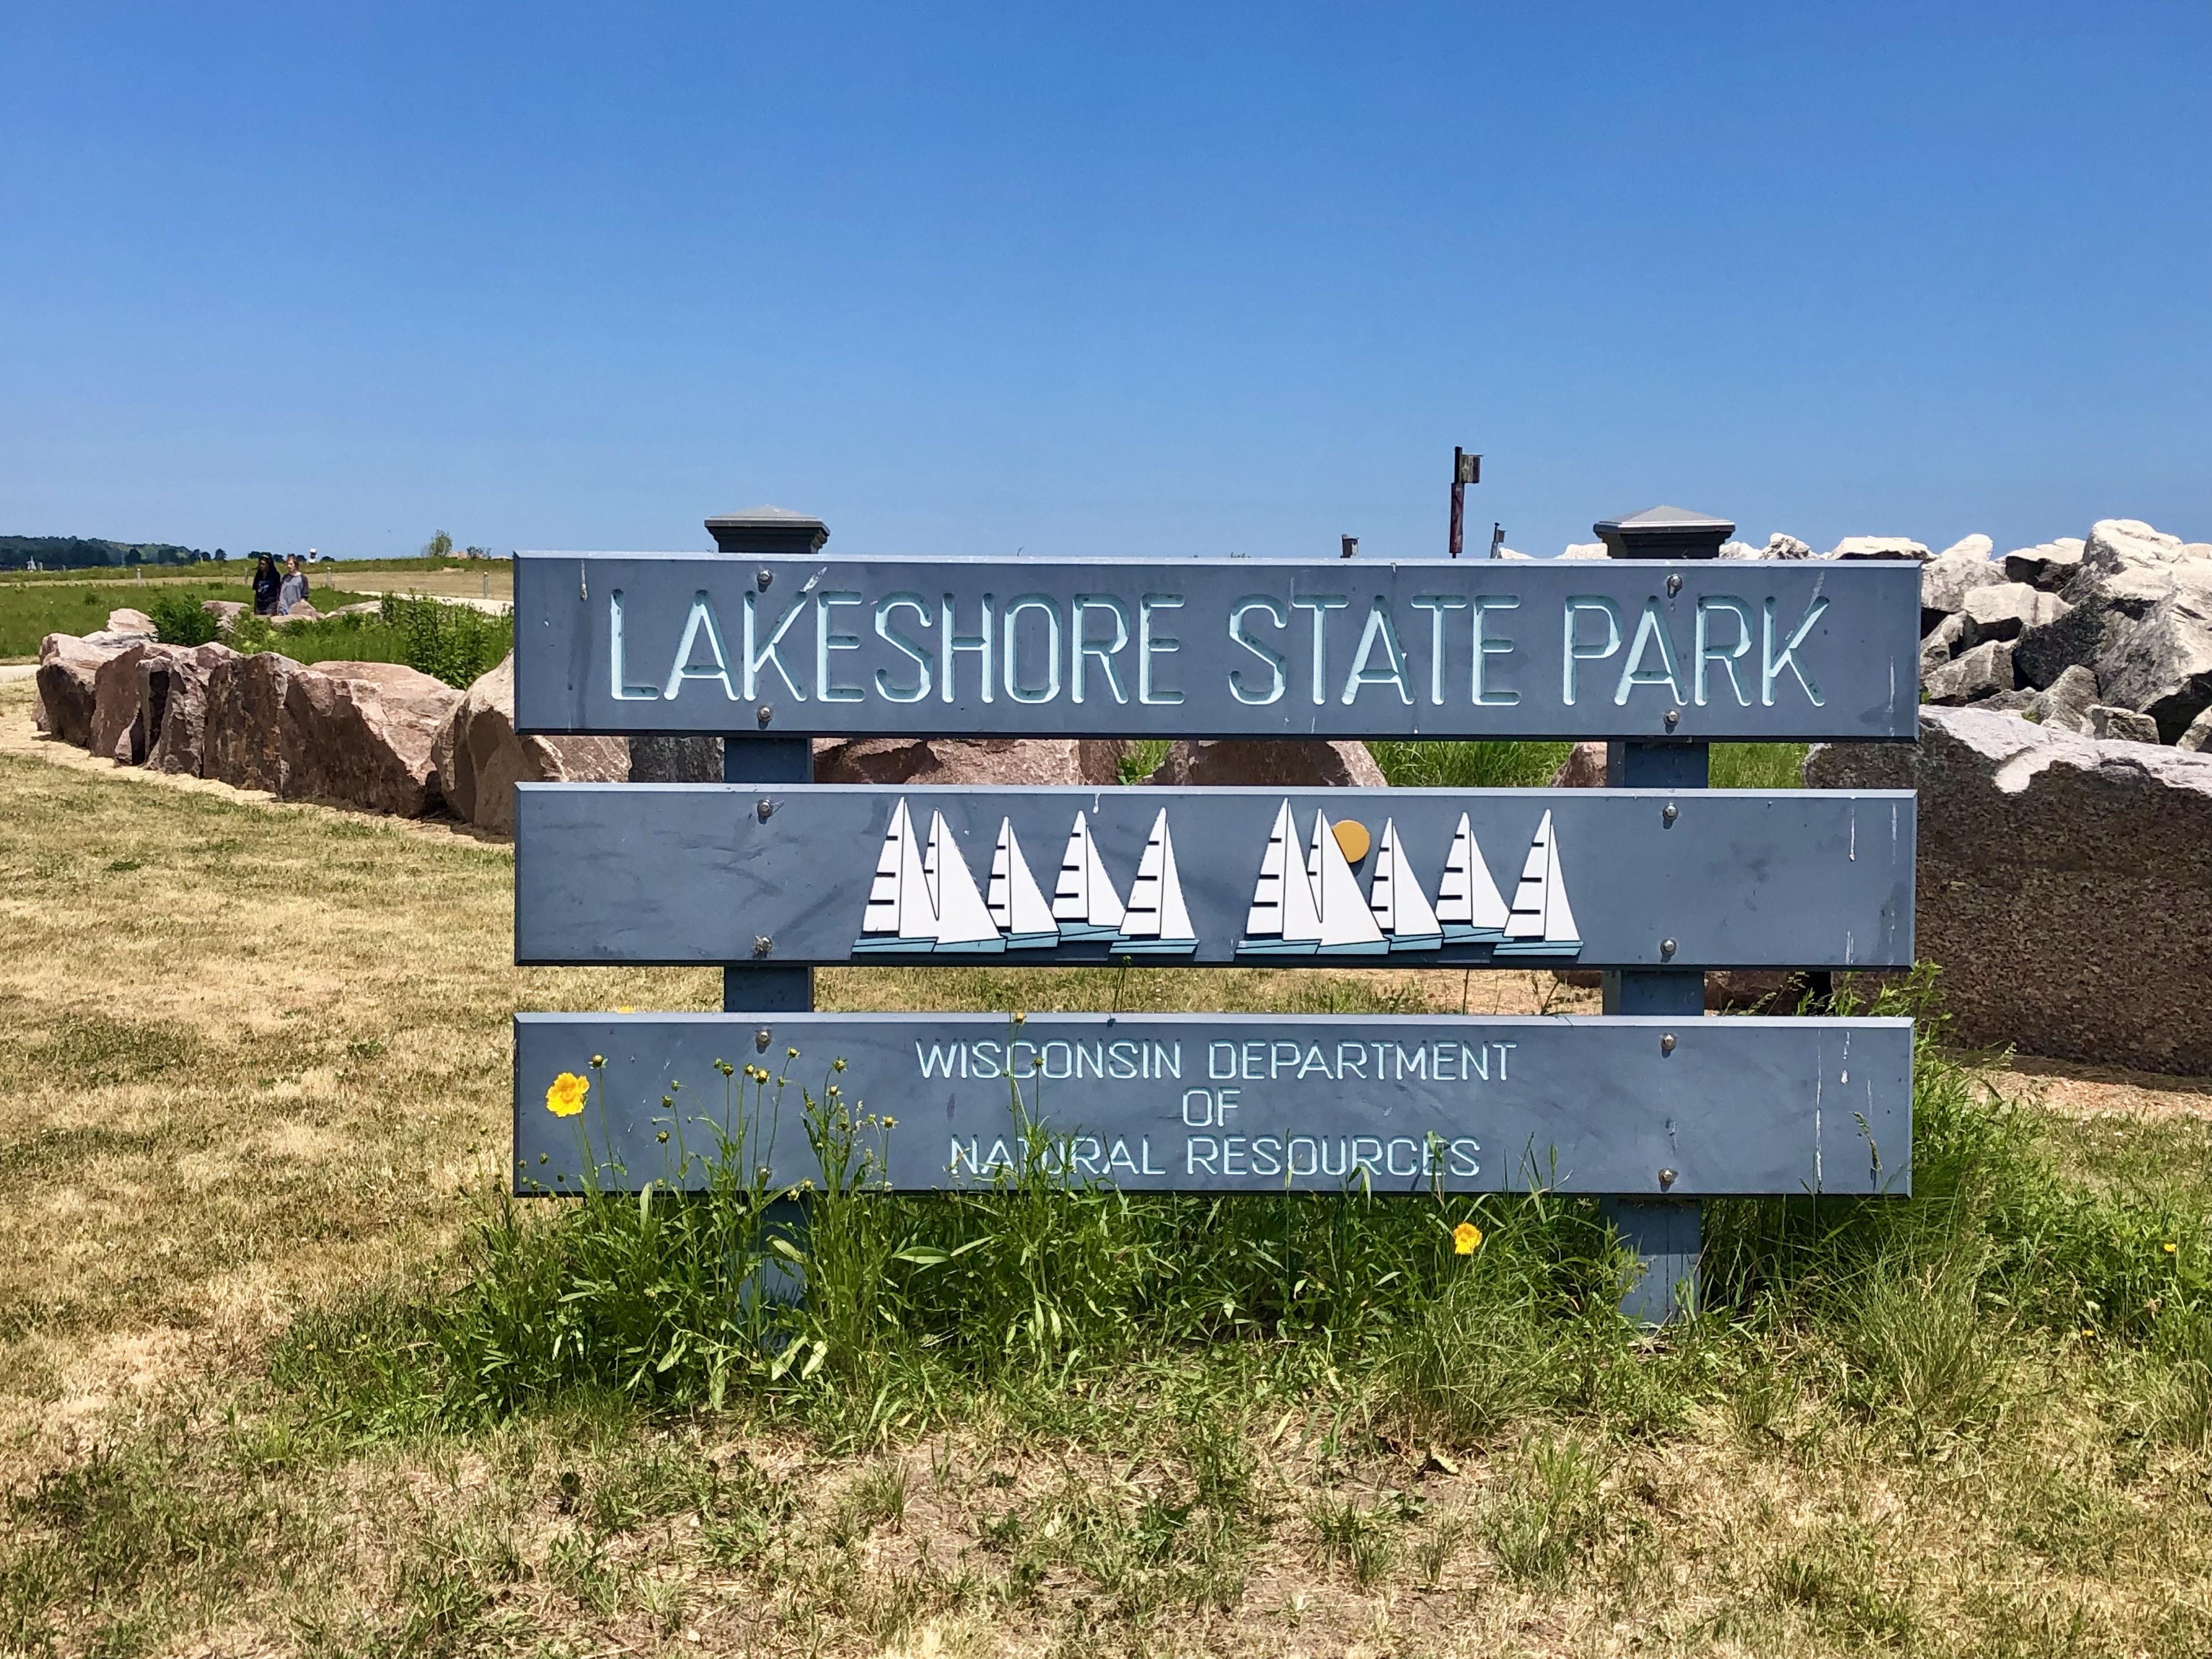 Lakeshore State Park has great views of the Milwaukee skyline